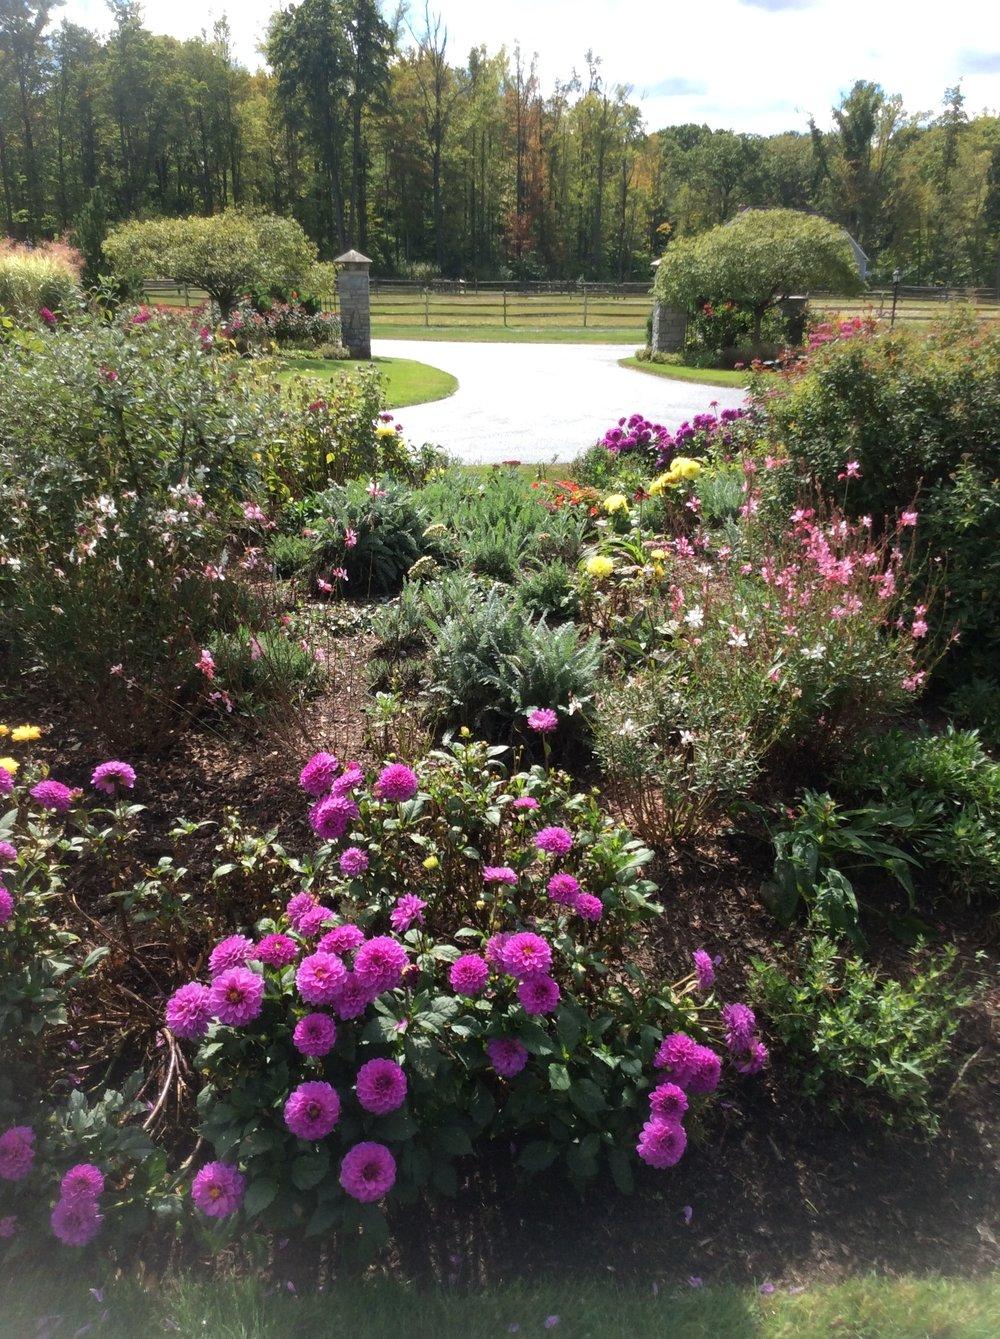 Unilock certifed landscape company in Bainbridge Township OH